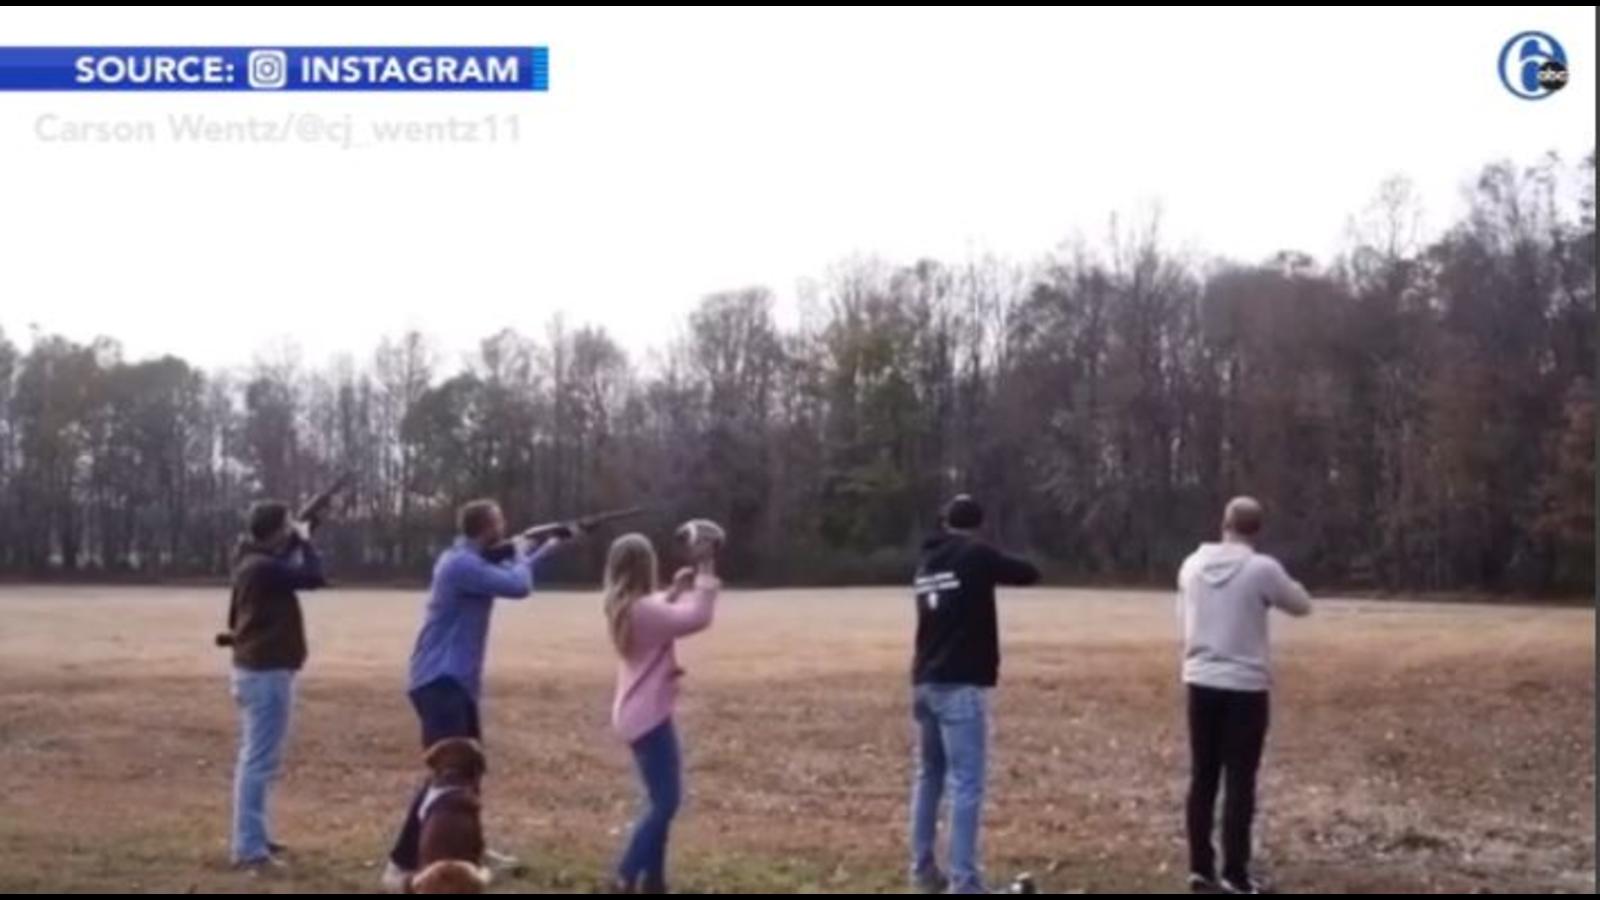 Eagles Quarterback Carson Wentz Shoots At Footballs In Baby Gender Reveal Video 6abc Philadelphia